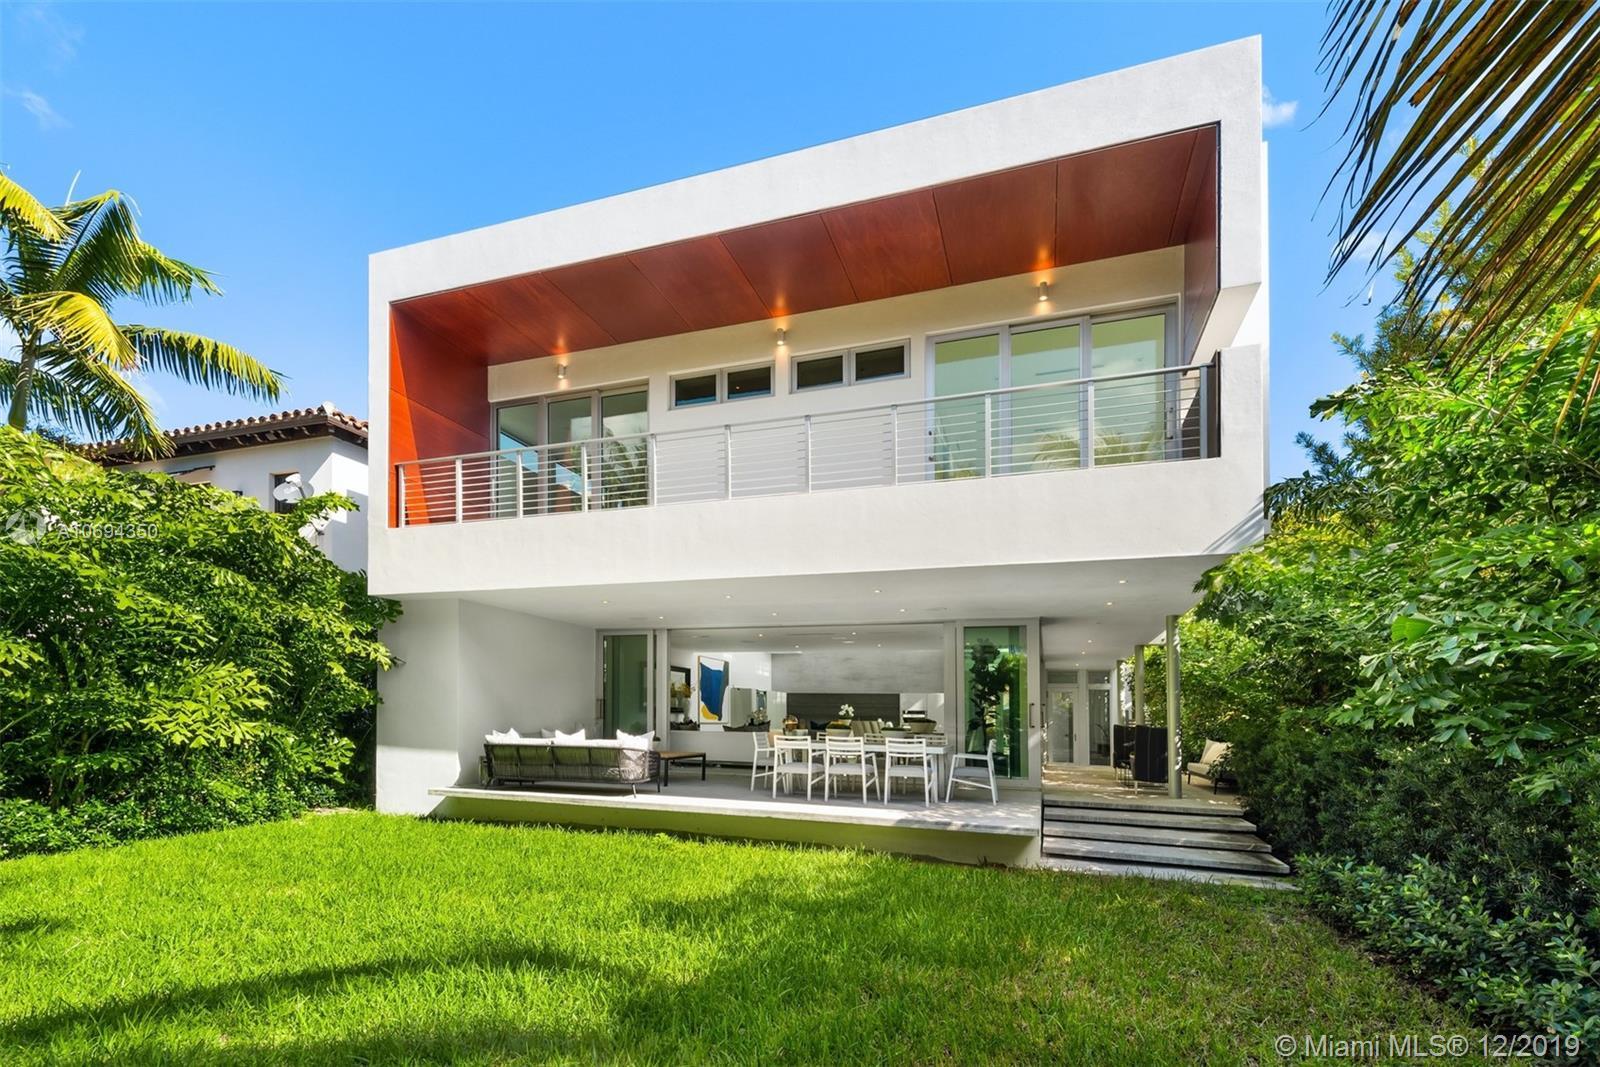 7830 Atlantic Way, Miami Beach, FL 33141 - Miami Beach, FL real estate listing